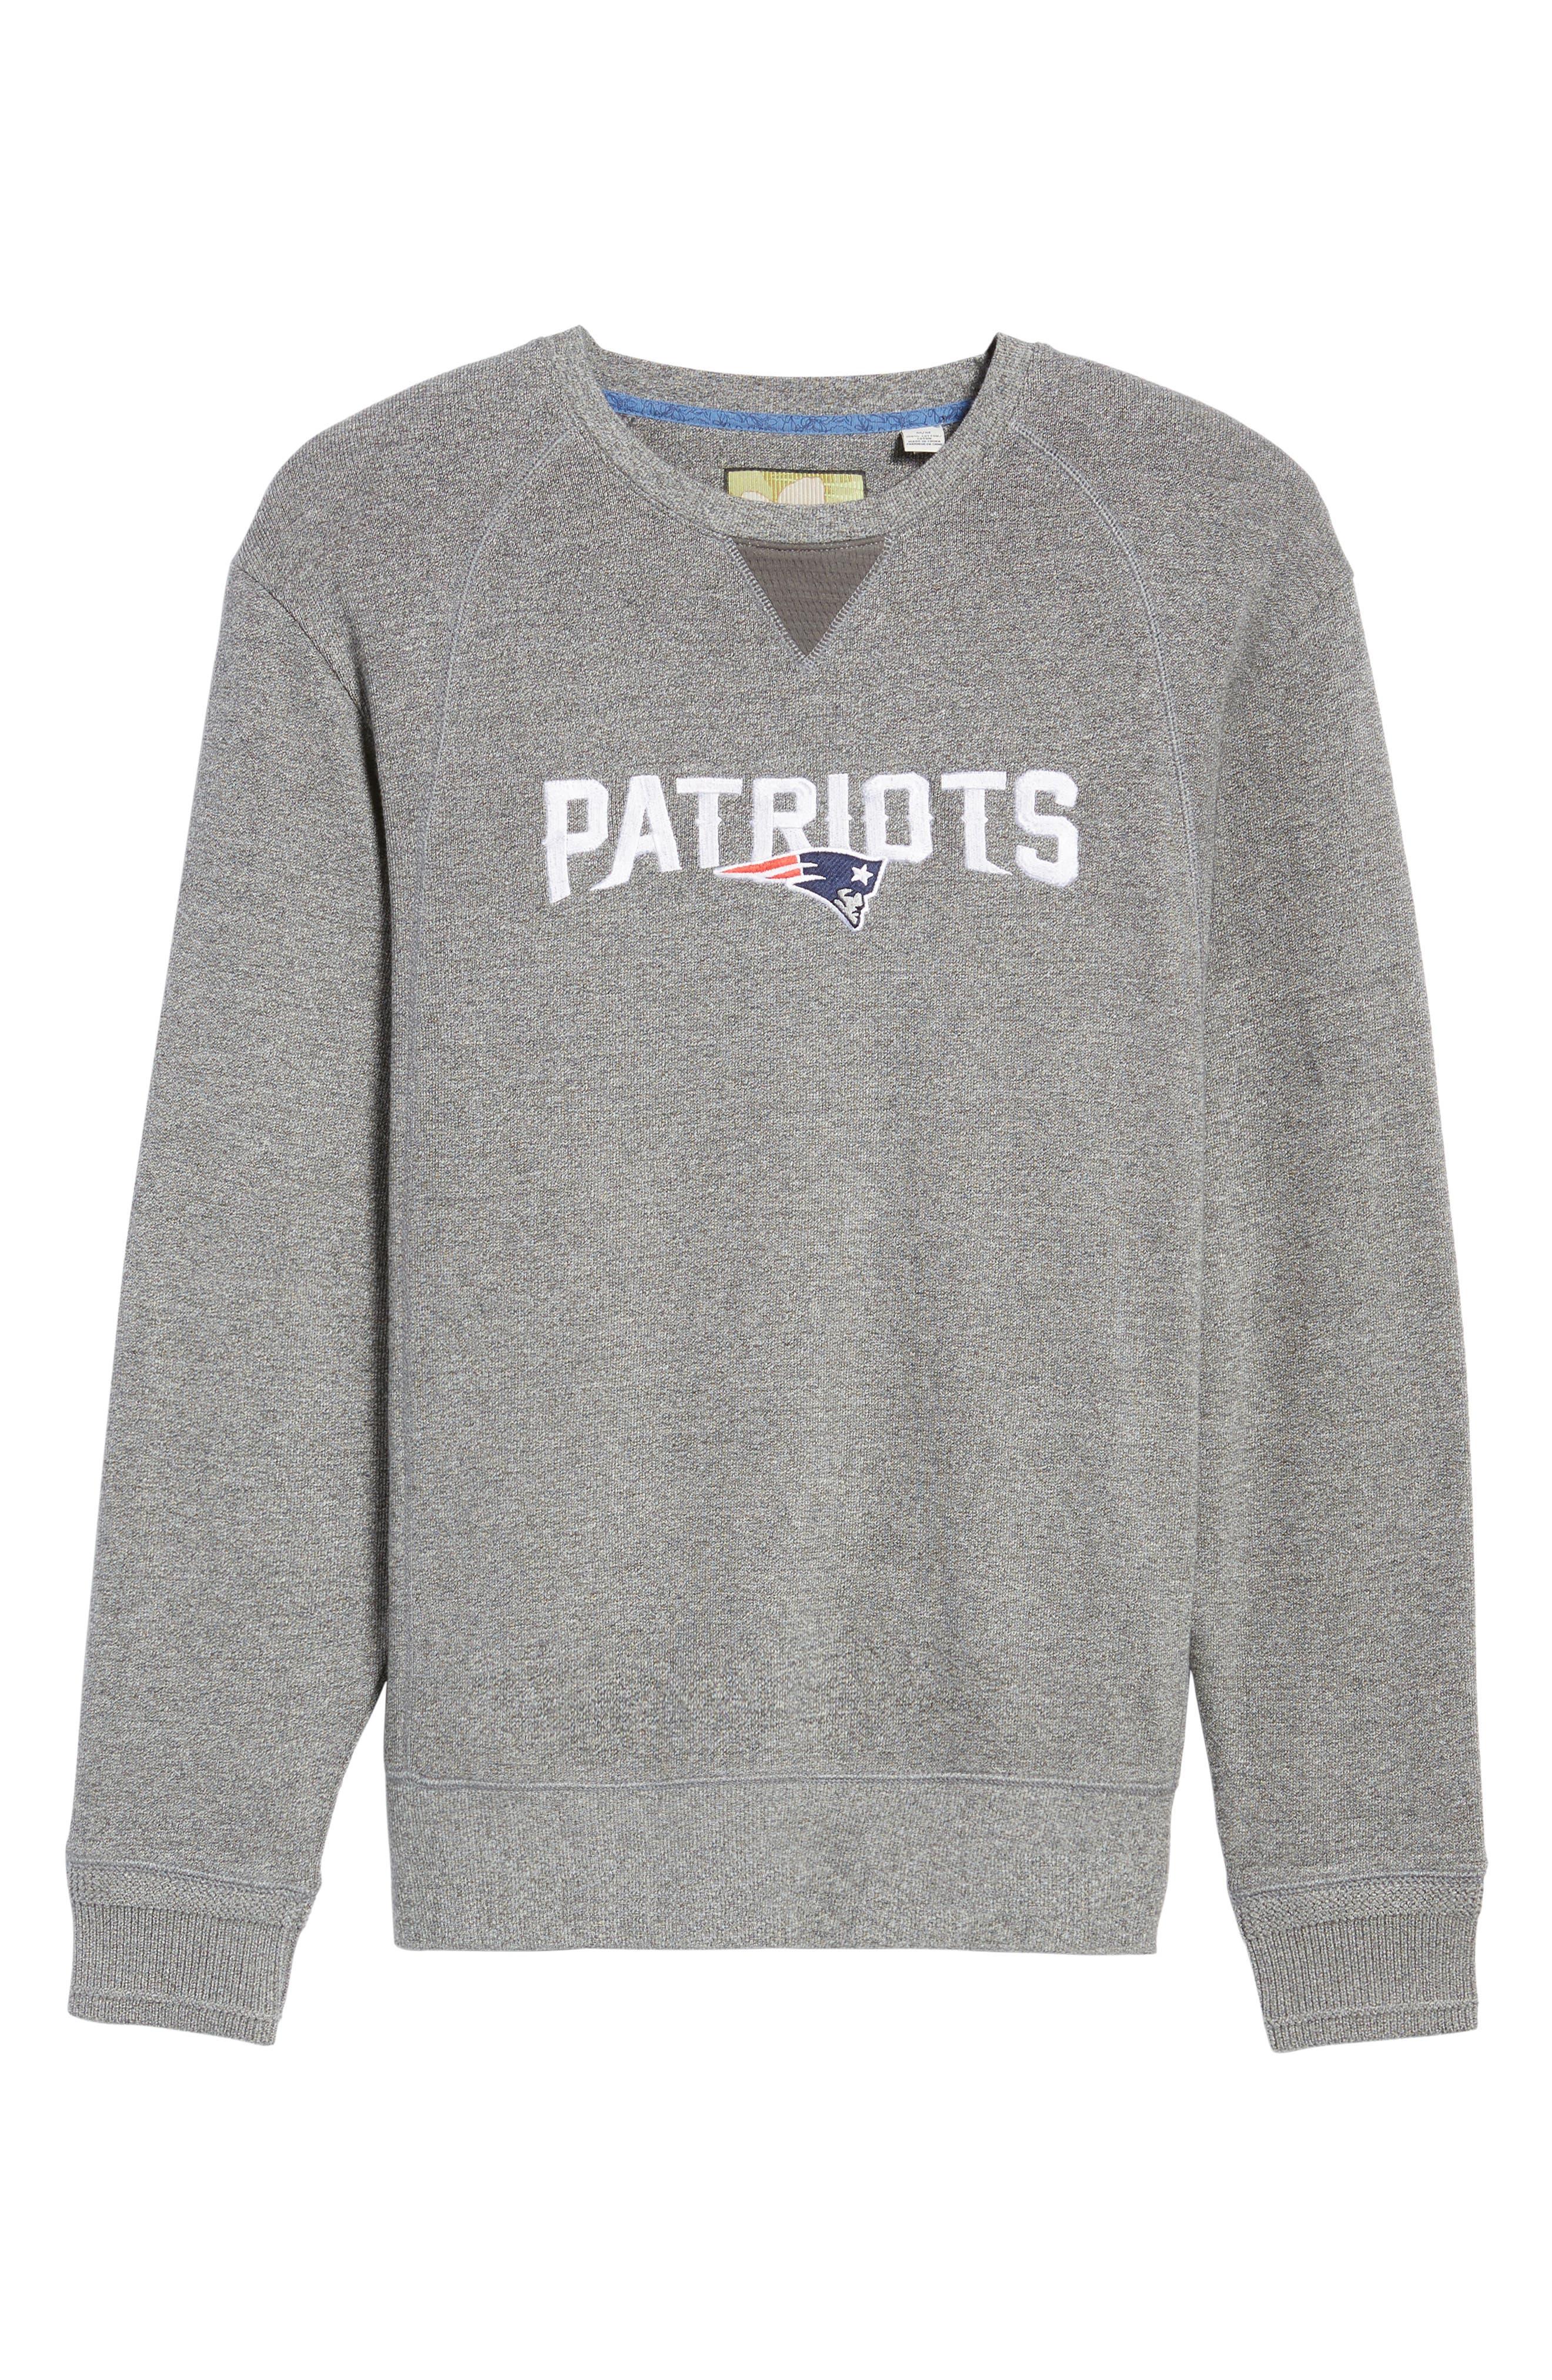 NFL Stitch of Liberty Embroidered Crewneck Sweatshirt,                             Alternate thumbnail 174, color,